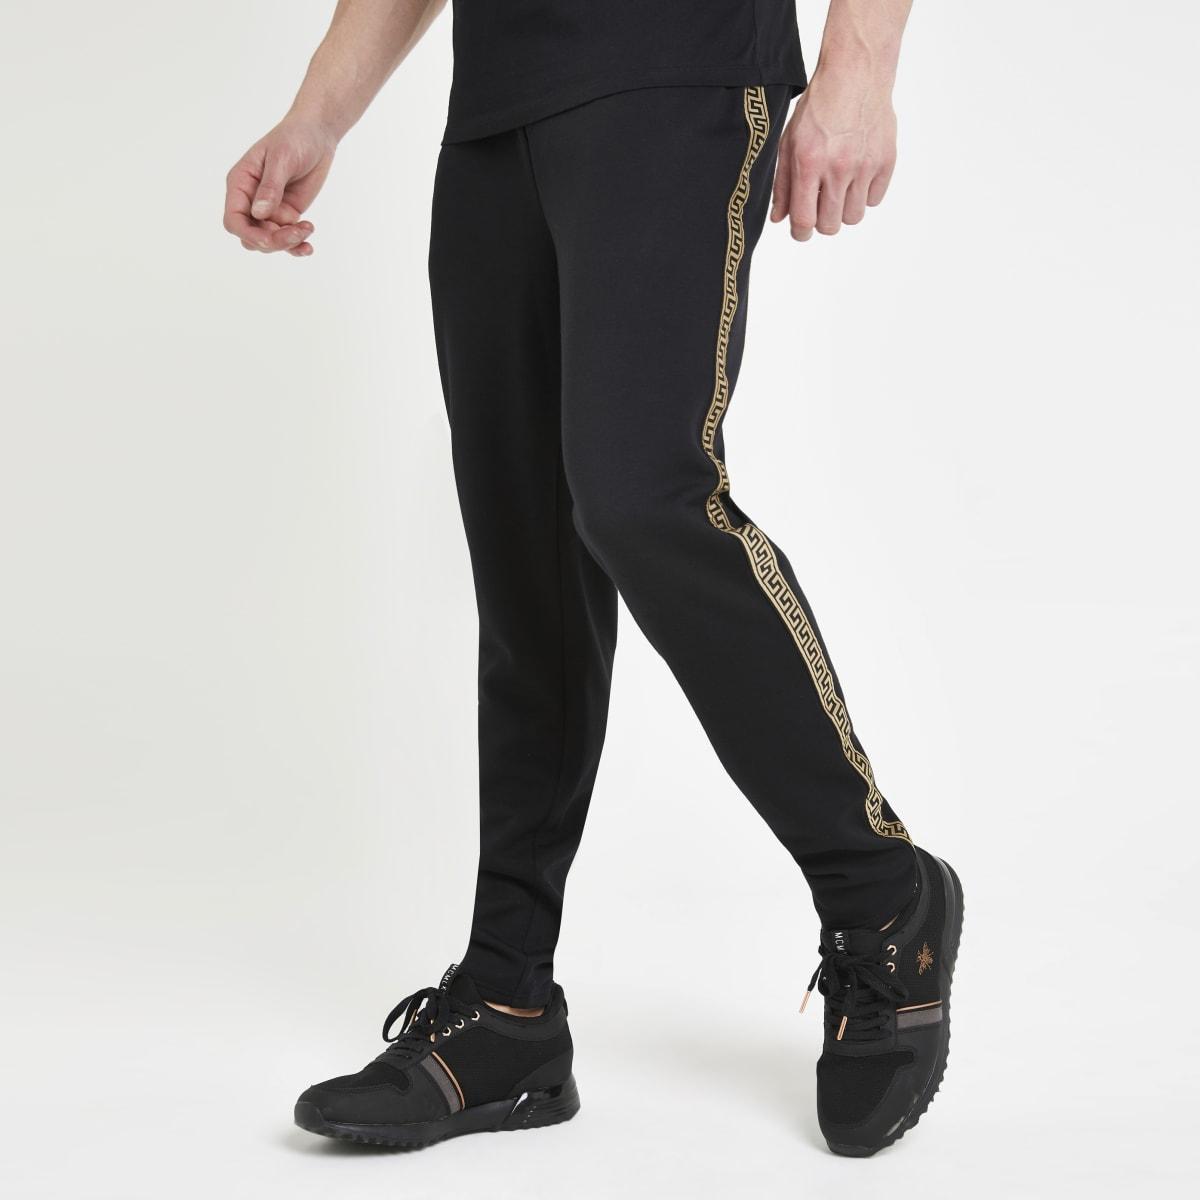 Schwarze Slim Fit Jogginghose mit Print